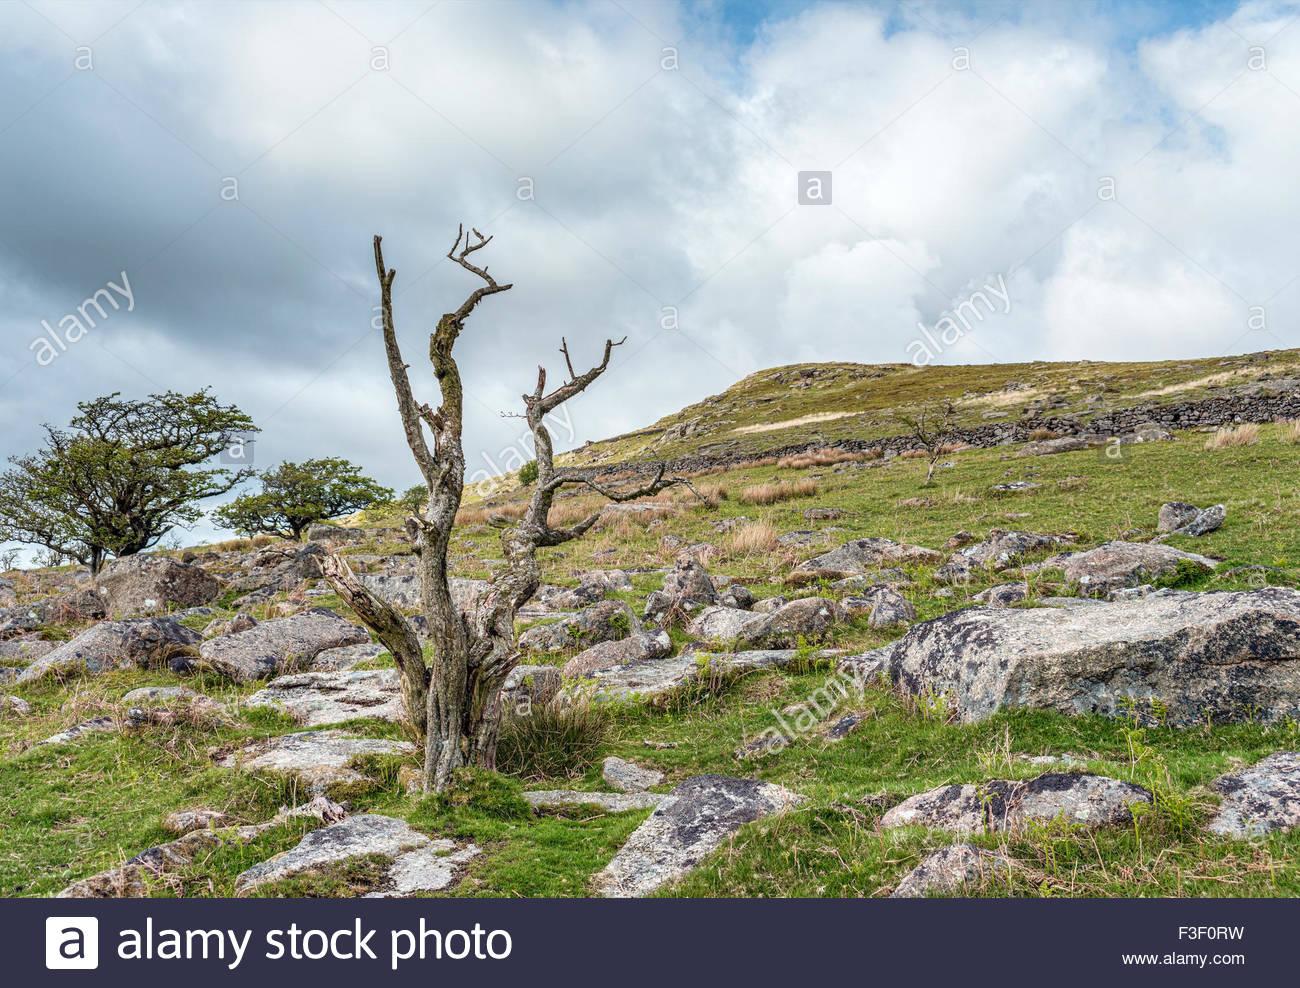 Landschaft im Nationalpark Dartmoor, Devon, England, UK | Landschaft Im Nationalpark Dartmoor, Devon, England, UK Stockbild